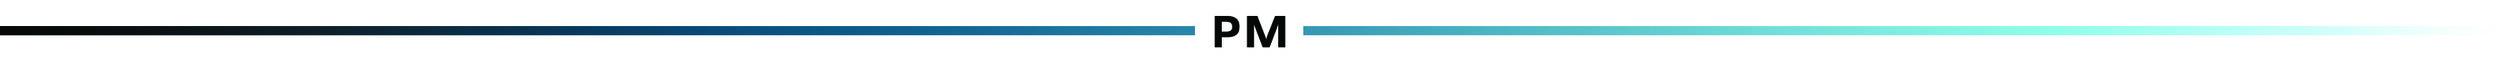 PM+line.jpg